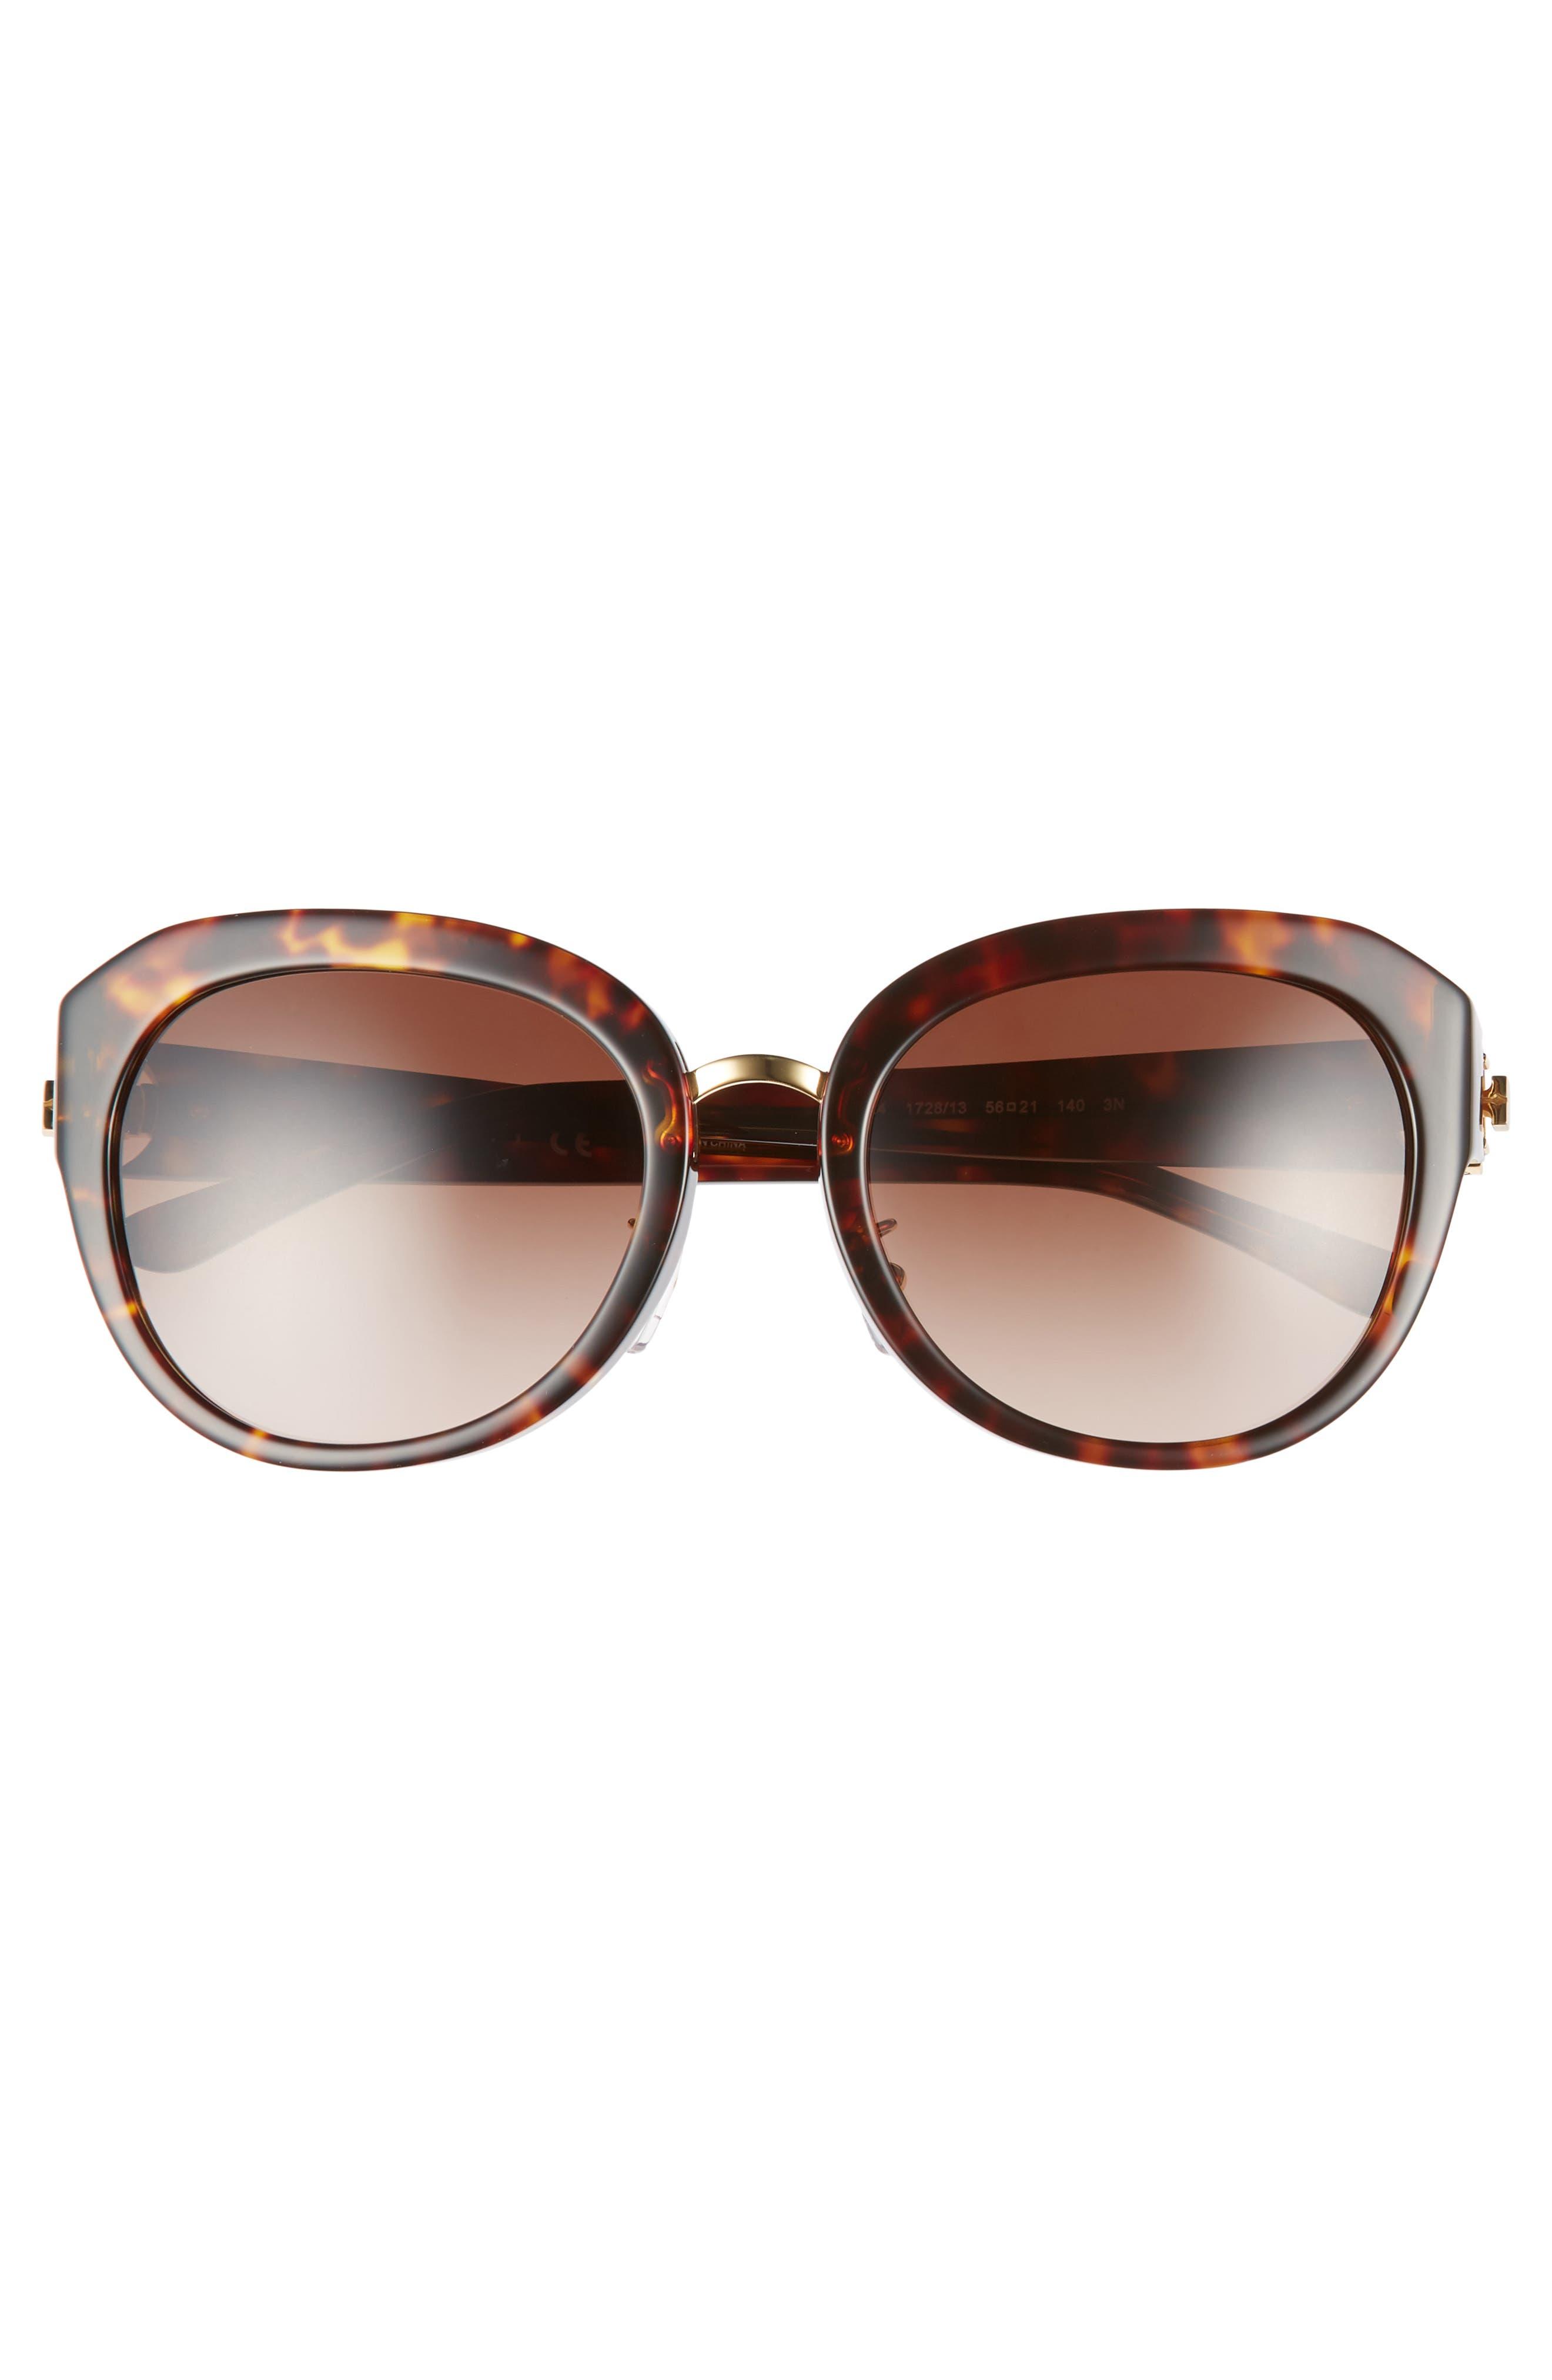 Irregular Reva 56mm Sunglasses,                             Alternate thumbnail 3, color,                             212